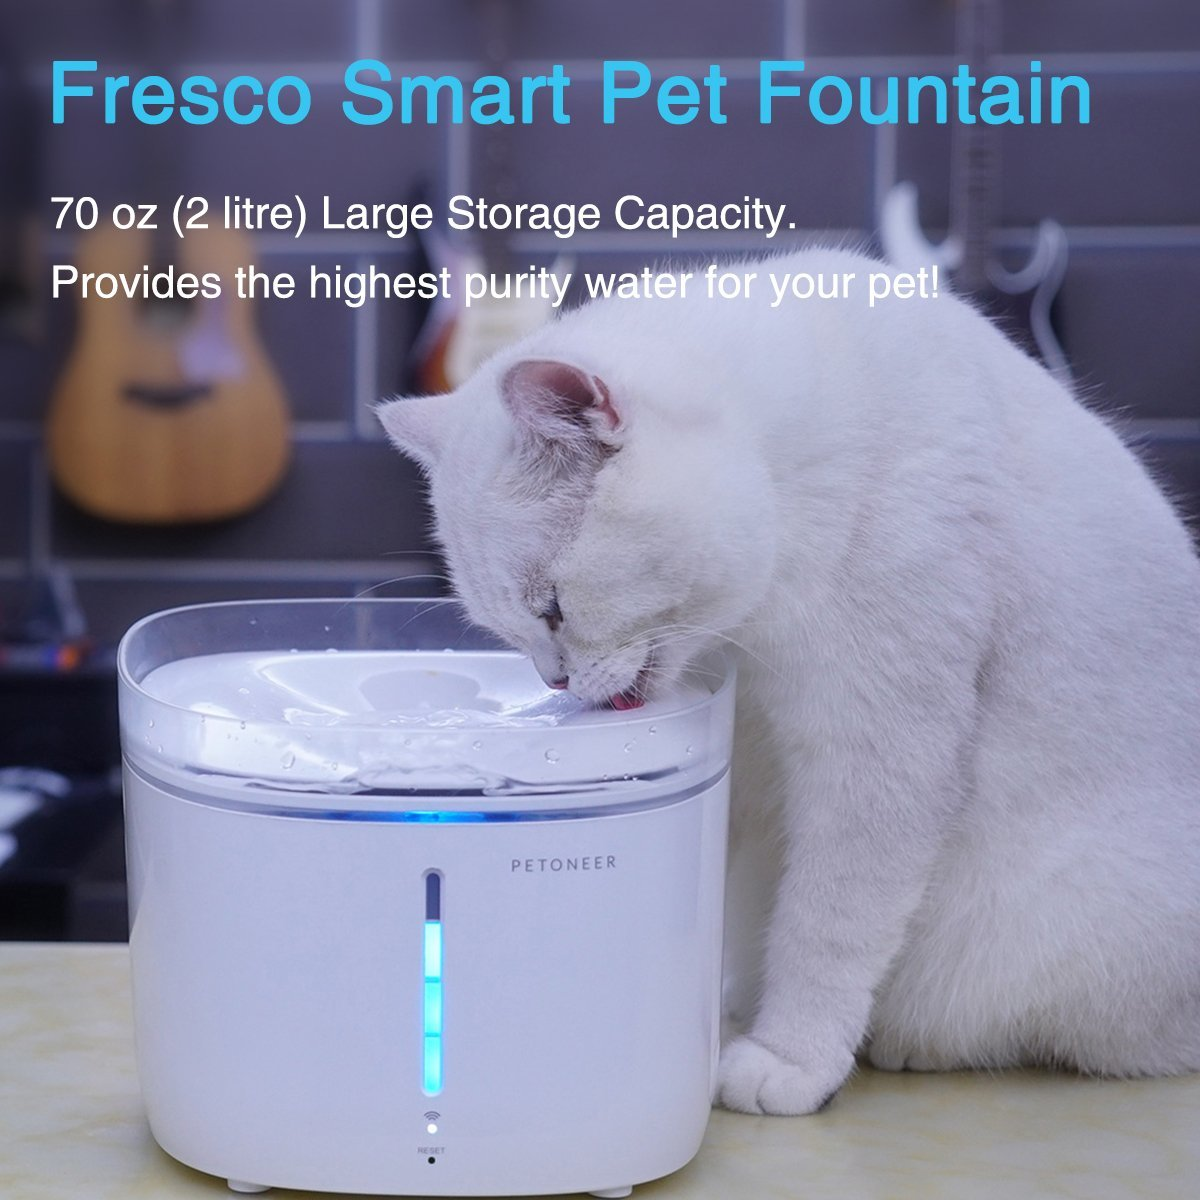 Petoneer: Fresco Pro Smart Pet Fountain image